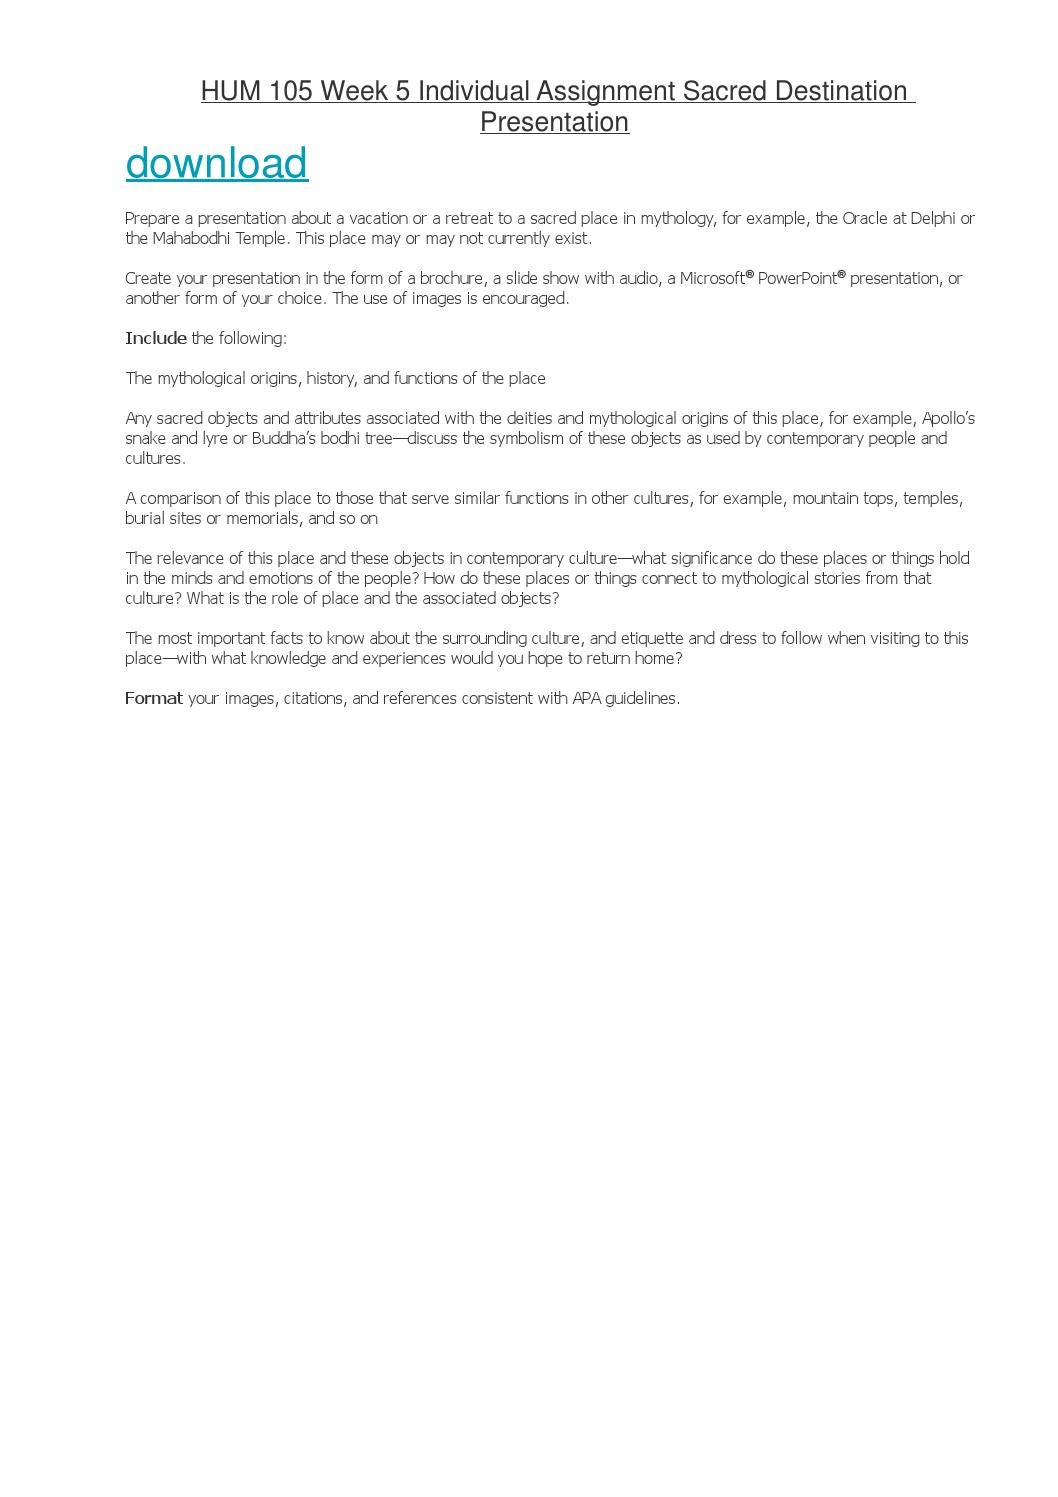 Informational Essay Prompts Csiro Marine And Atmospheric Research Paper No  Memory Essays also Unique Persuasive Essay Topics Dream Act Essay Views High School Argumentative Essay Topics